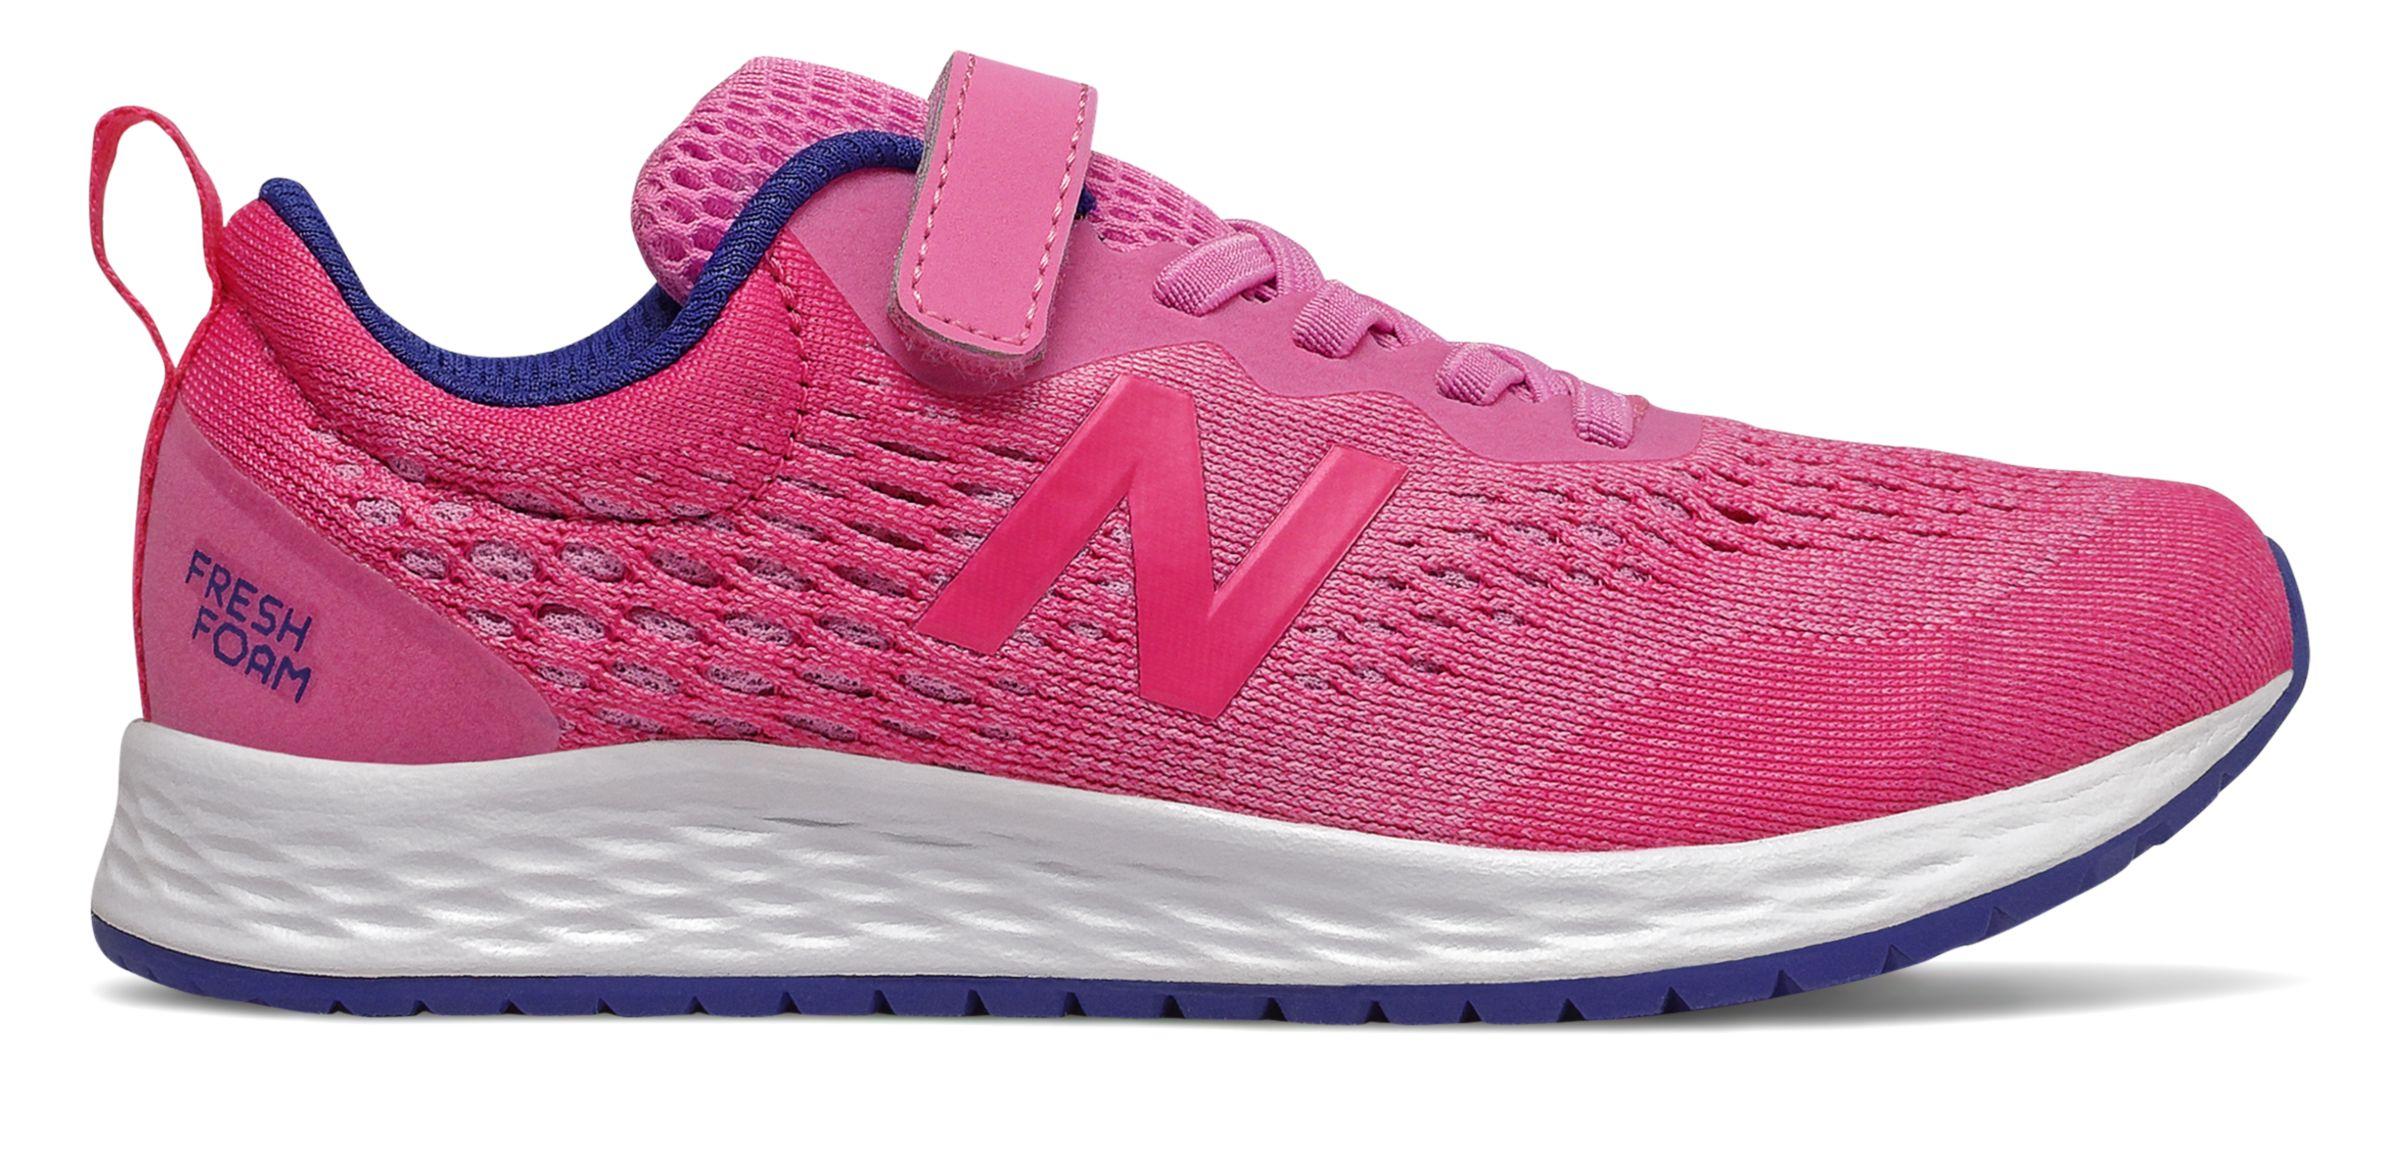 Niñas New Balance Fresh Foam Arishi - Candy Pink/Exuberant Pink/Marine Blue, Candy Pink/Exuberant Pink/Marine Blue